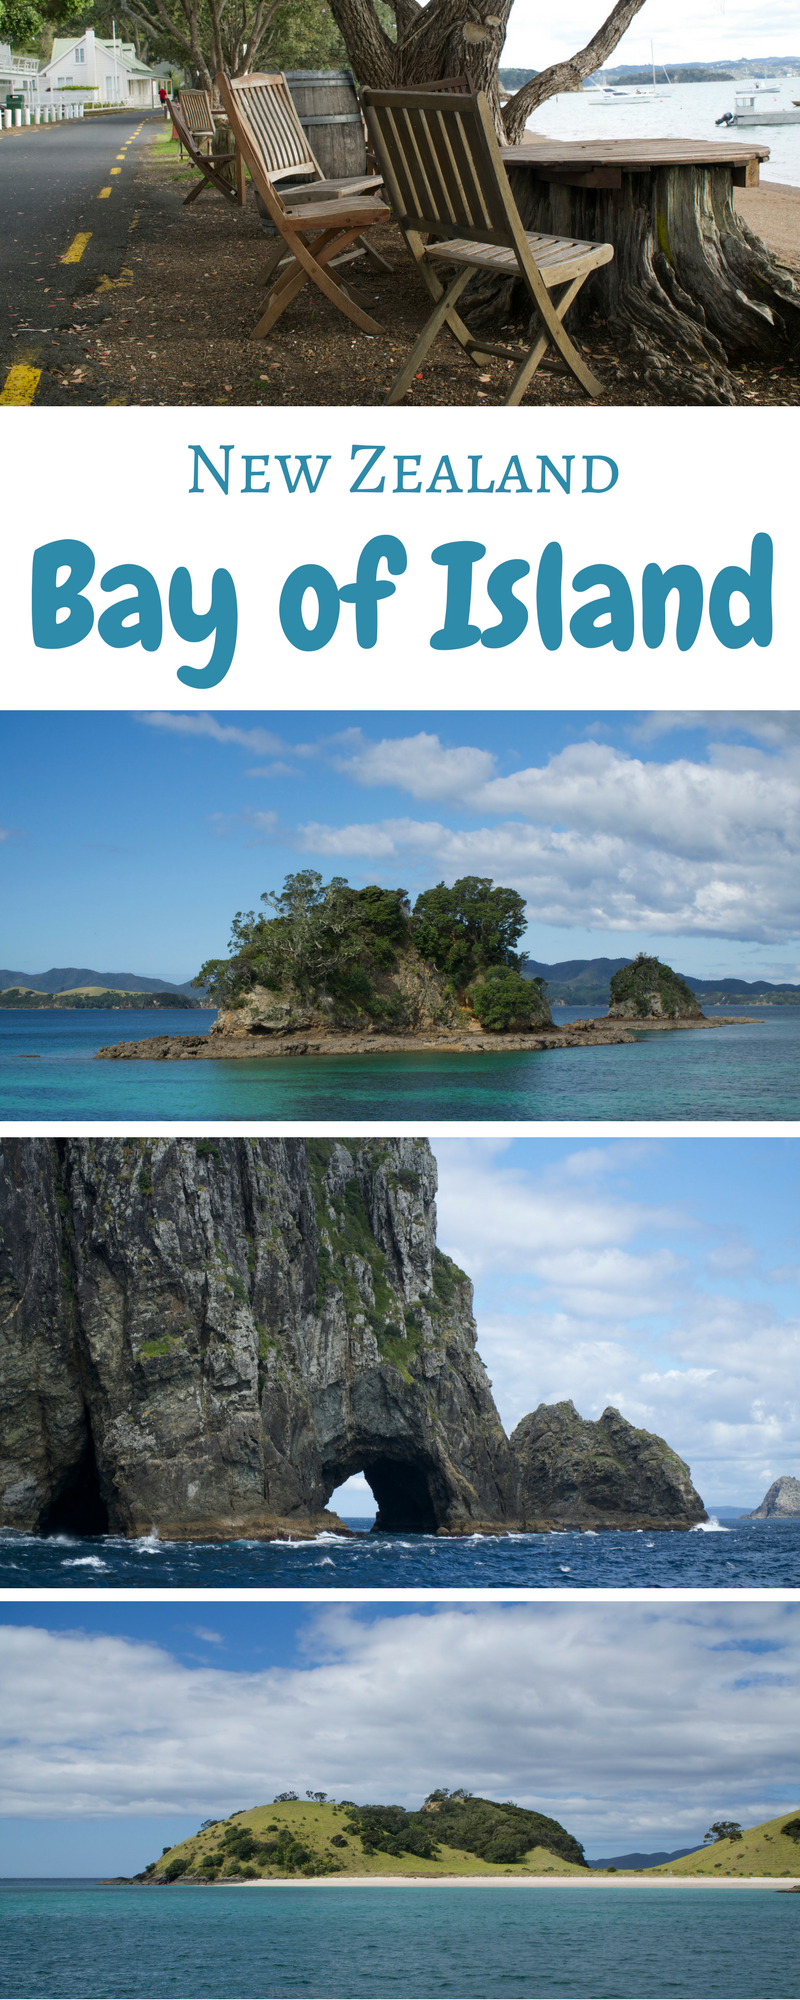 neuseeland bay of islands reisen travel neuseeland. Black Bedroom Furniture Sets. Home Design Ideas